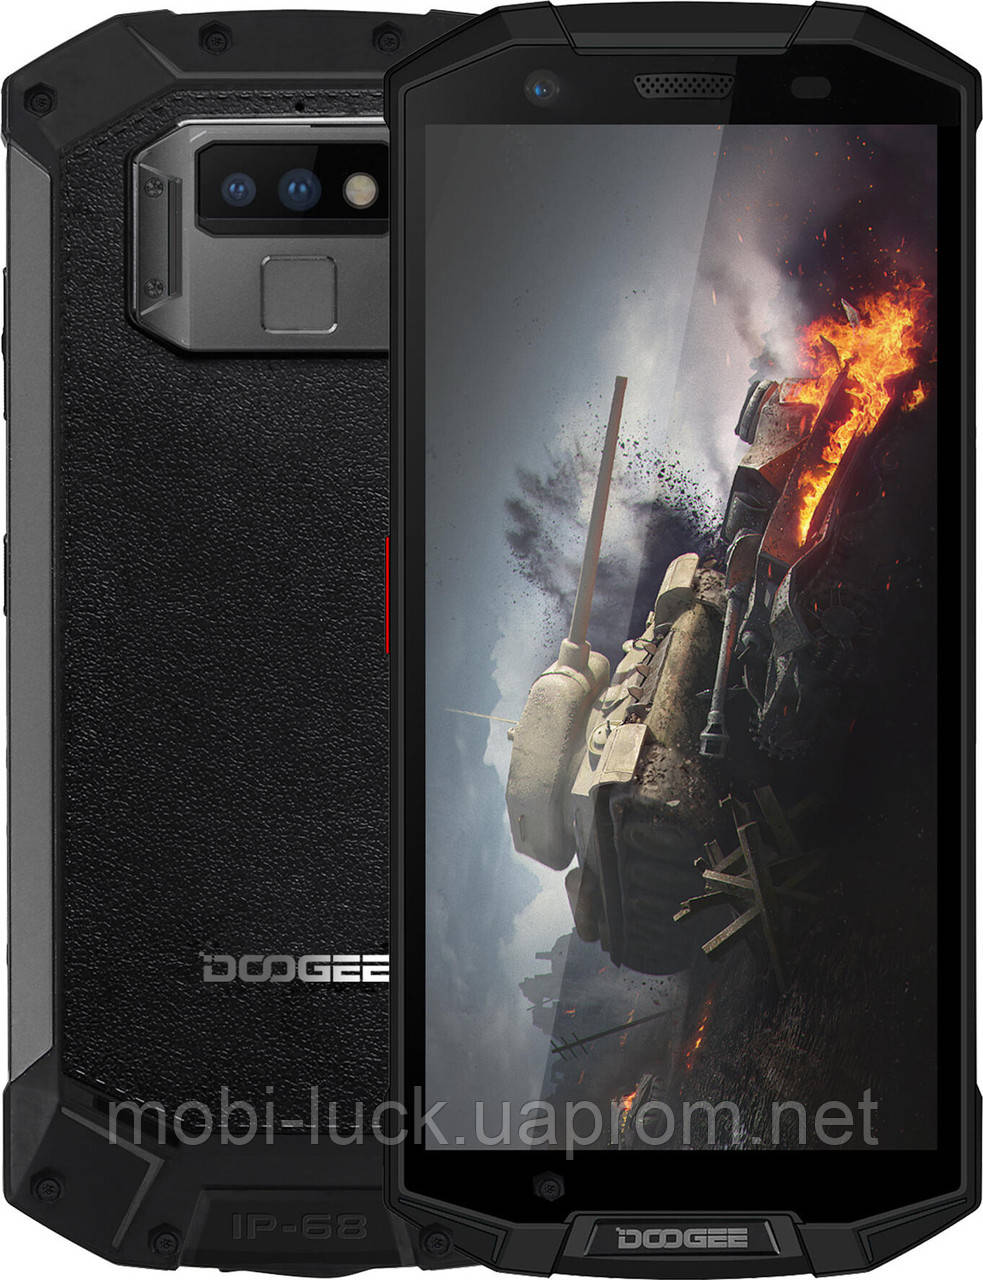 Смартфон Doogee S70 6/64GB Black + gamepad (Global)